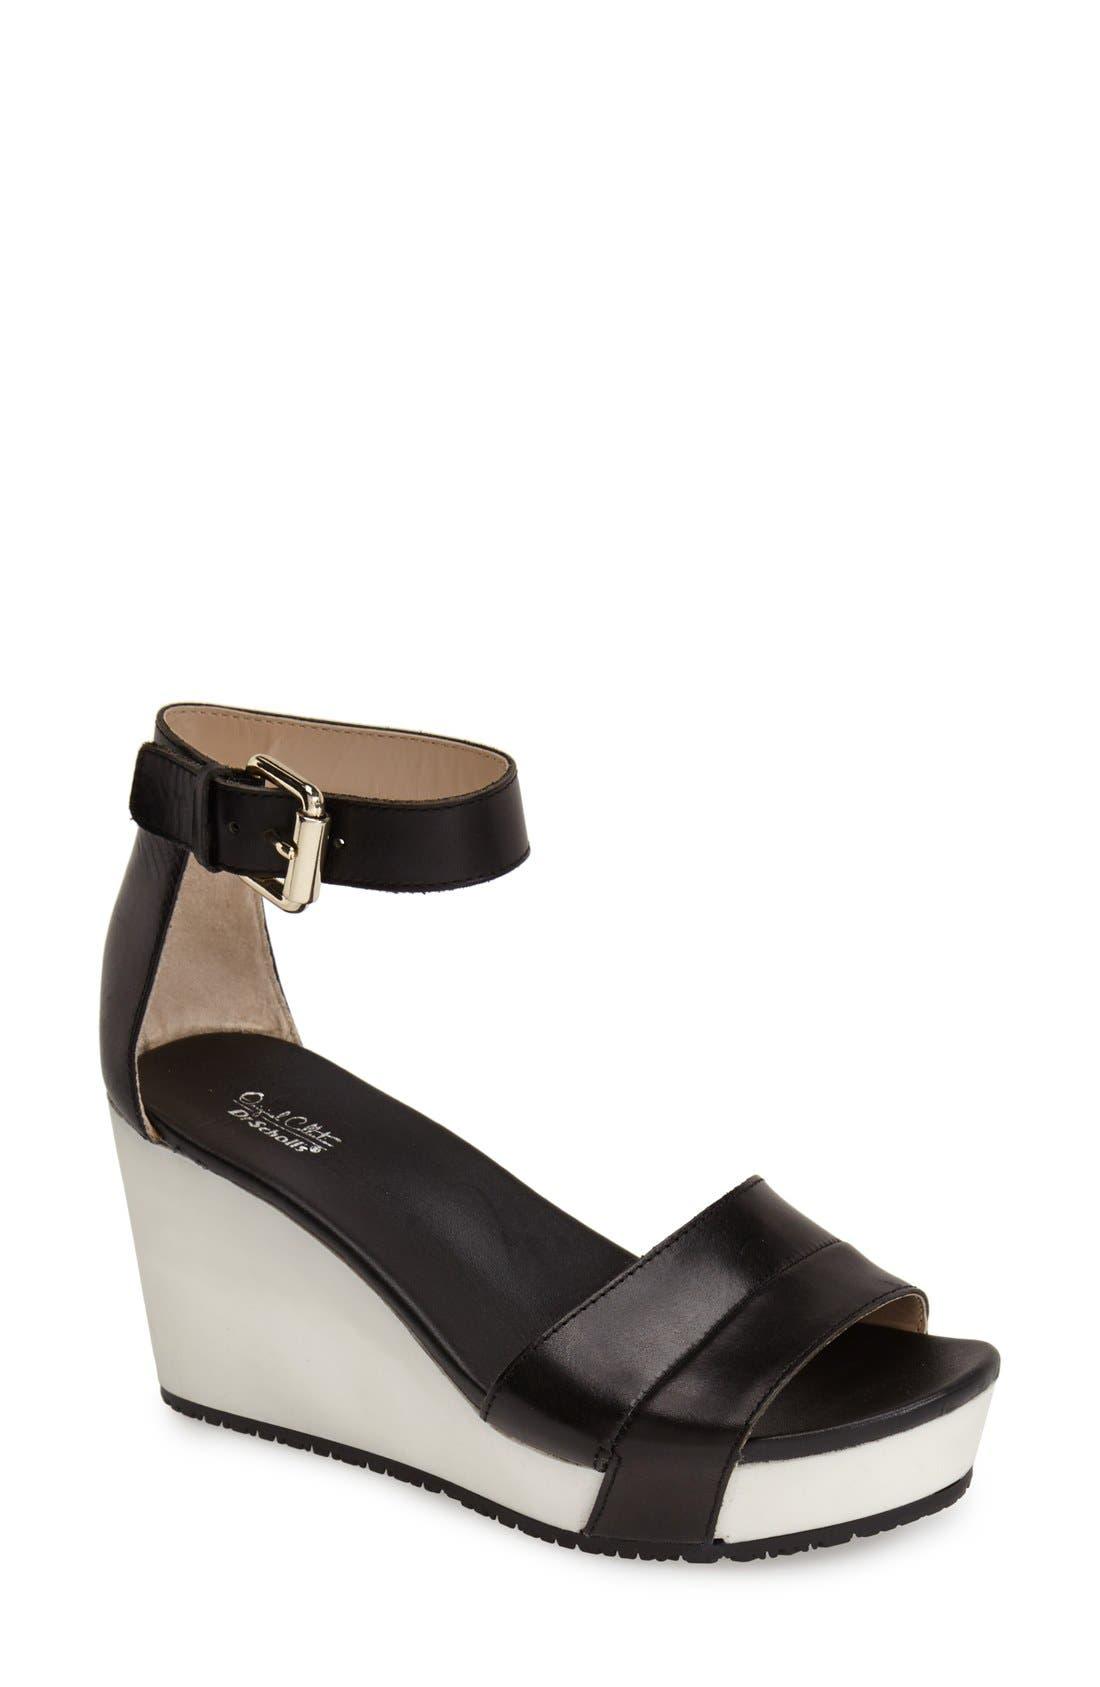 Alternate Image 1 Selected - Dr. Scholl's Original Collection 'Warner' Wedge Sandal (Women)